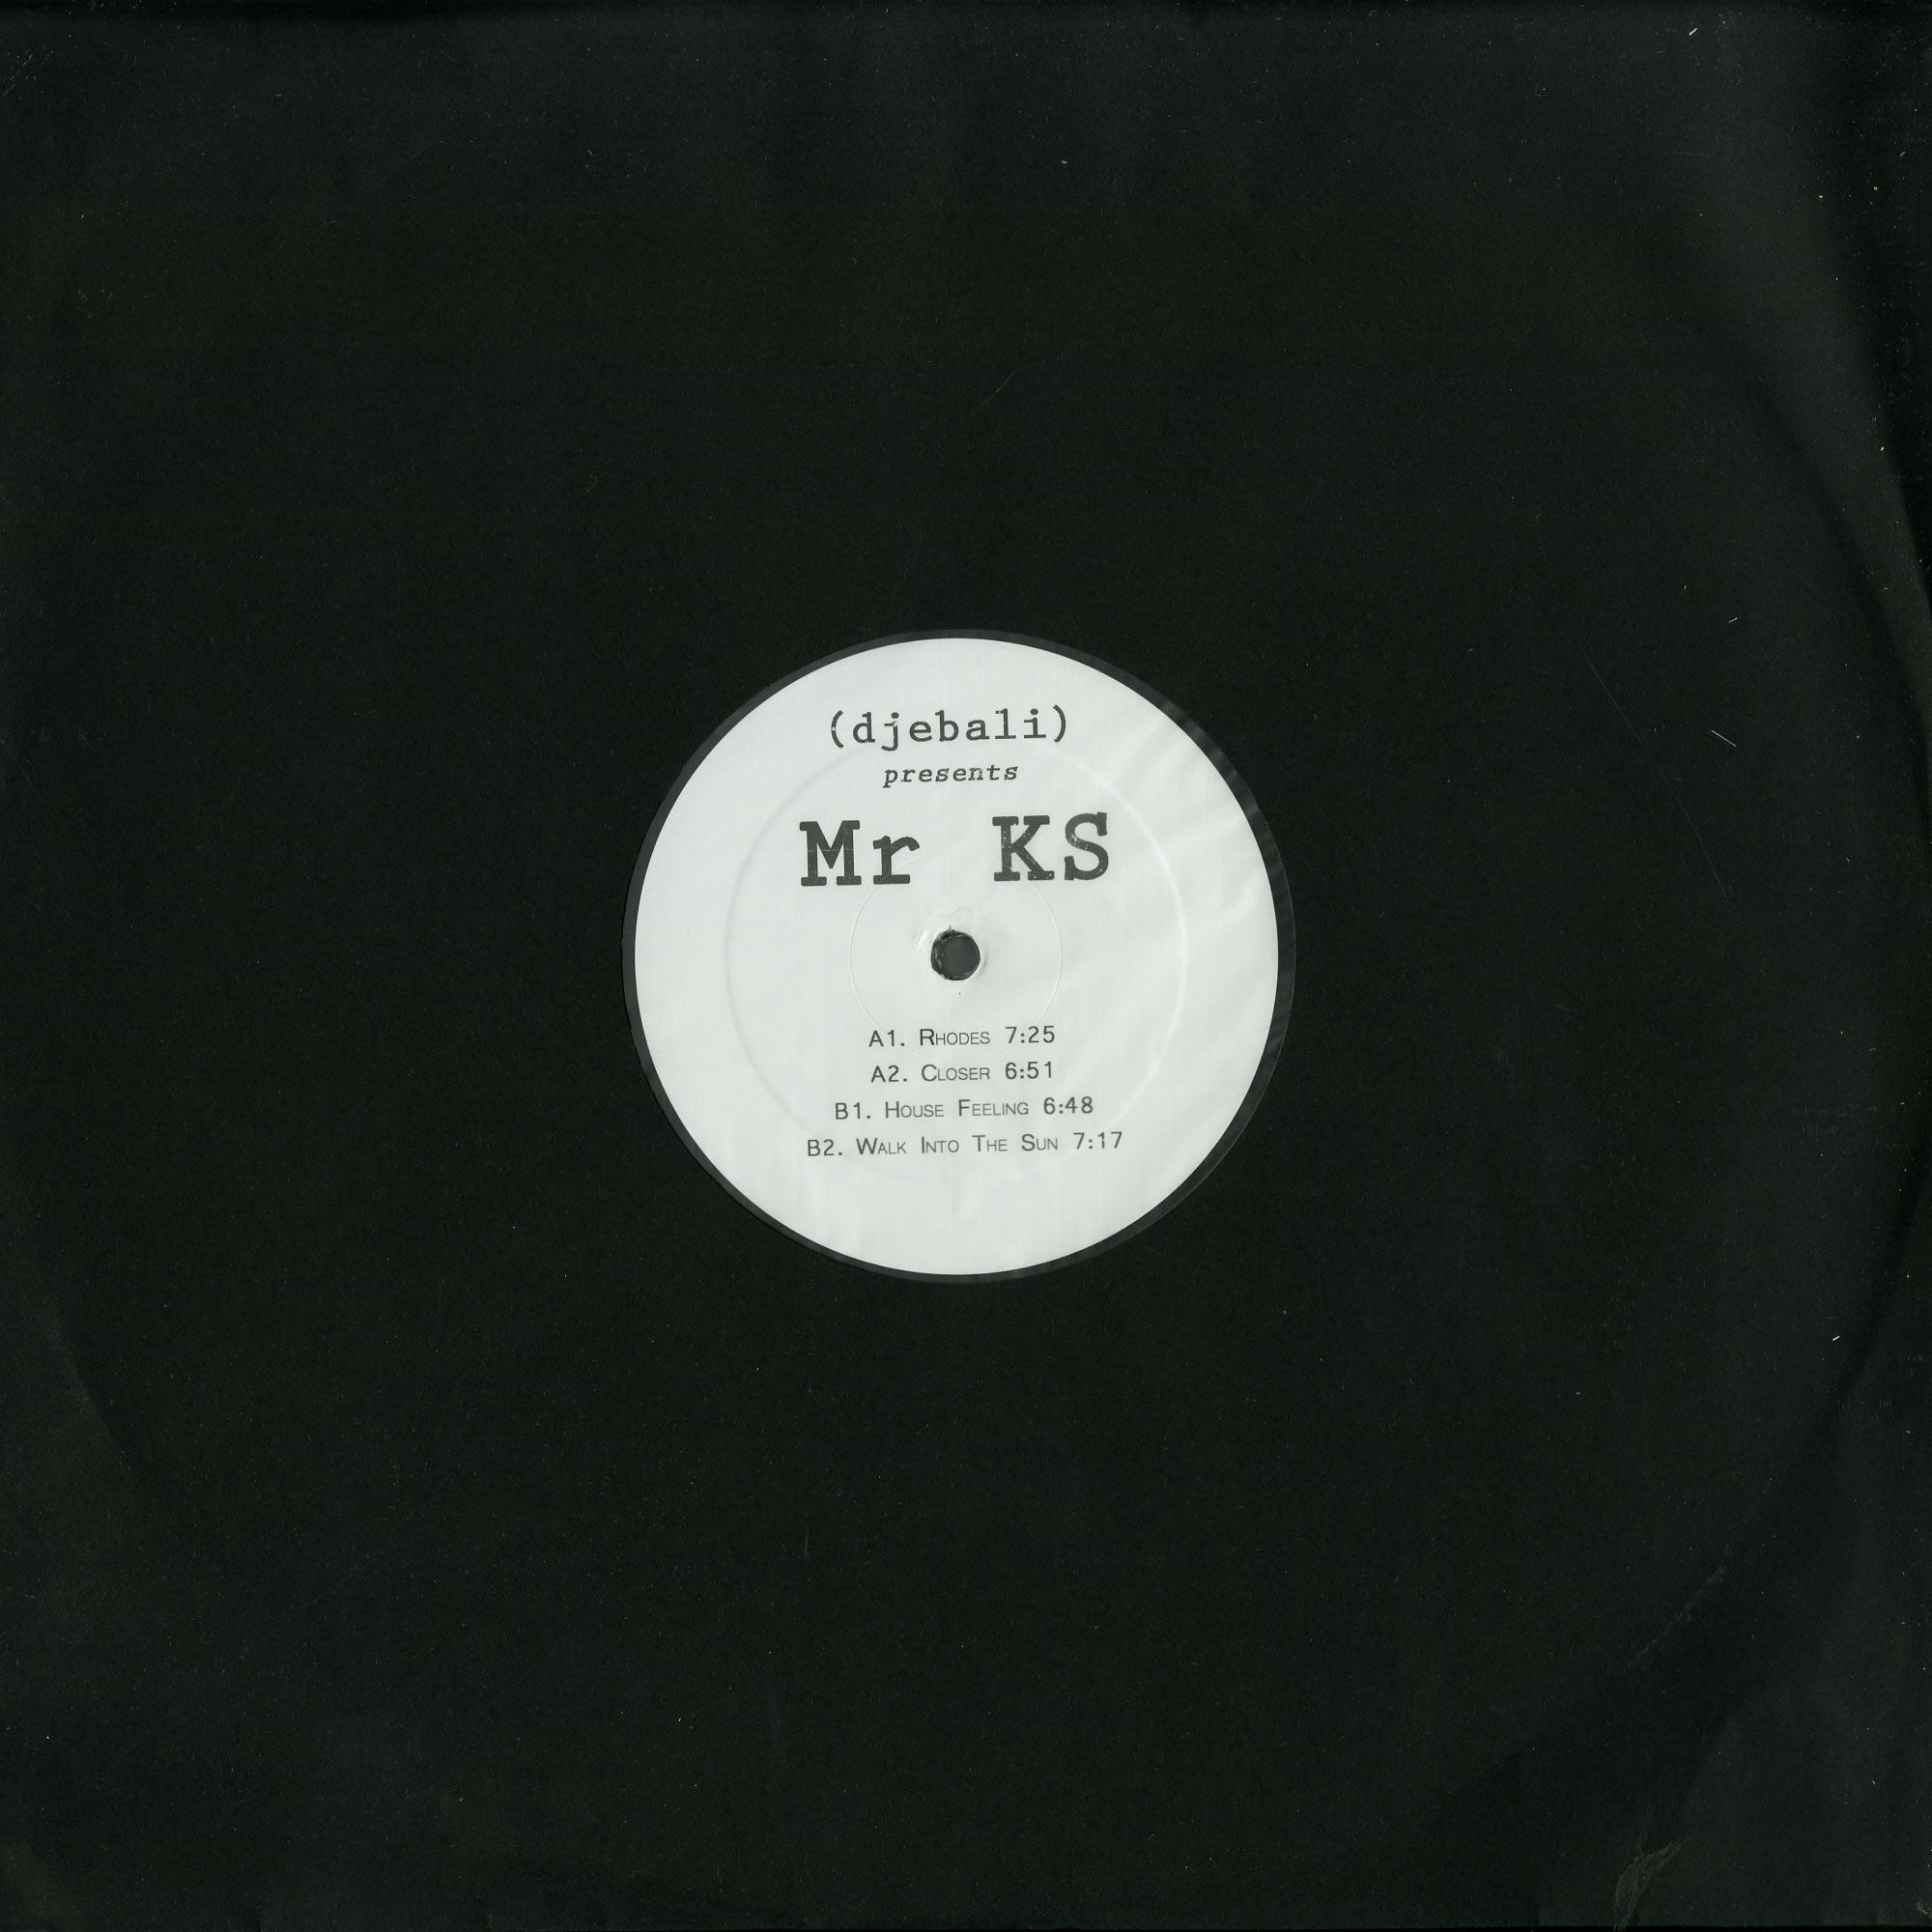 Djebali Presents Mr KS - EP